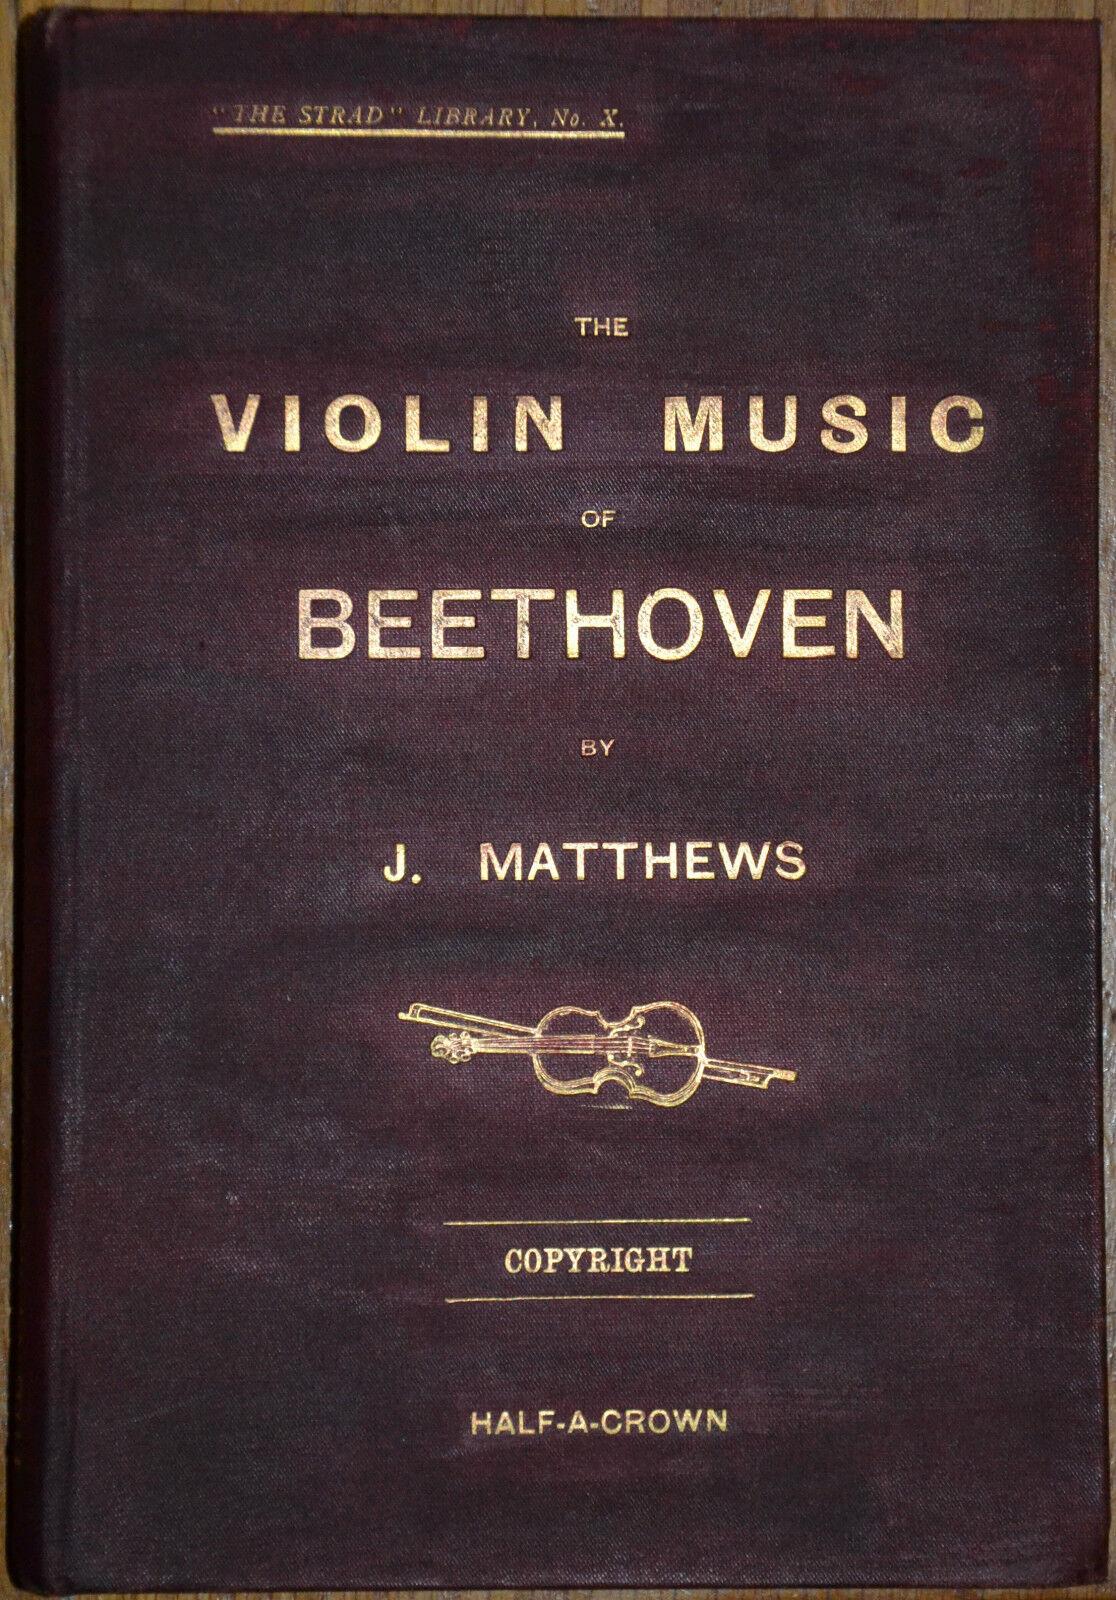 The Violin Music Of Beethoven Strad No X J.Matthews 1902 Erste Auflage